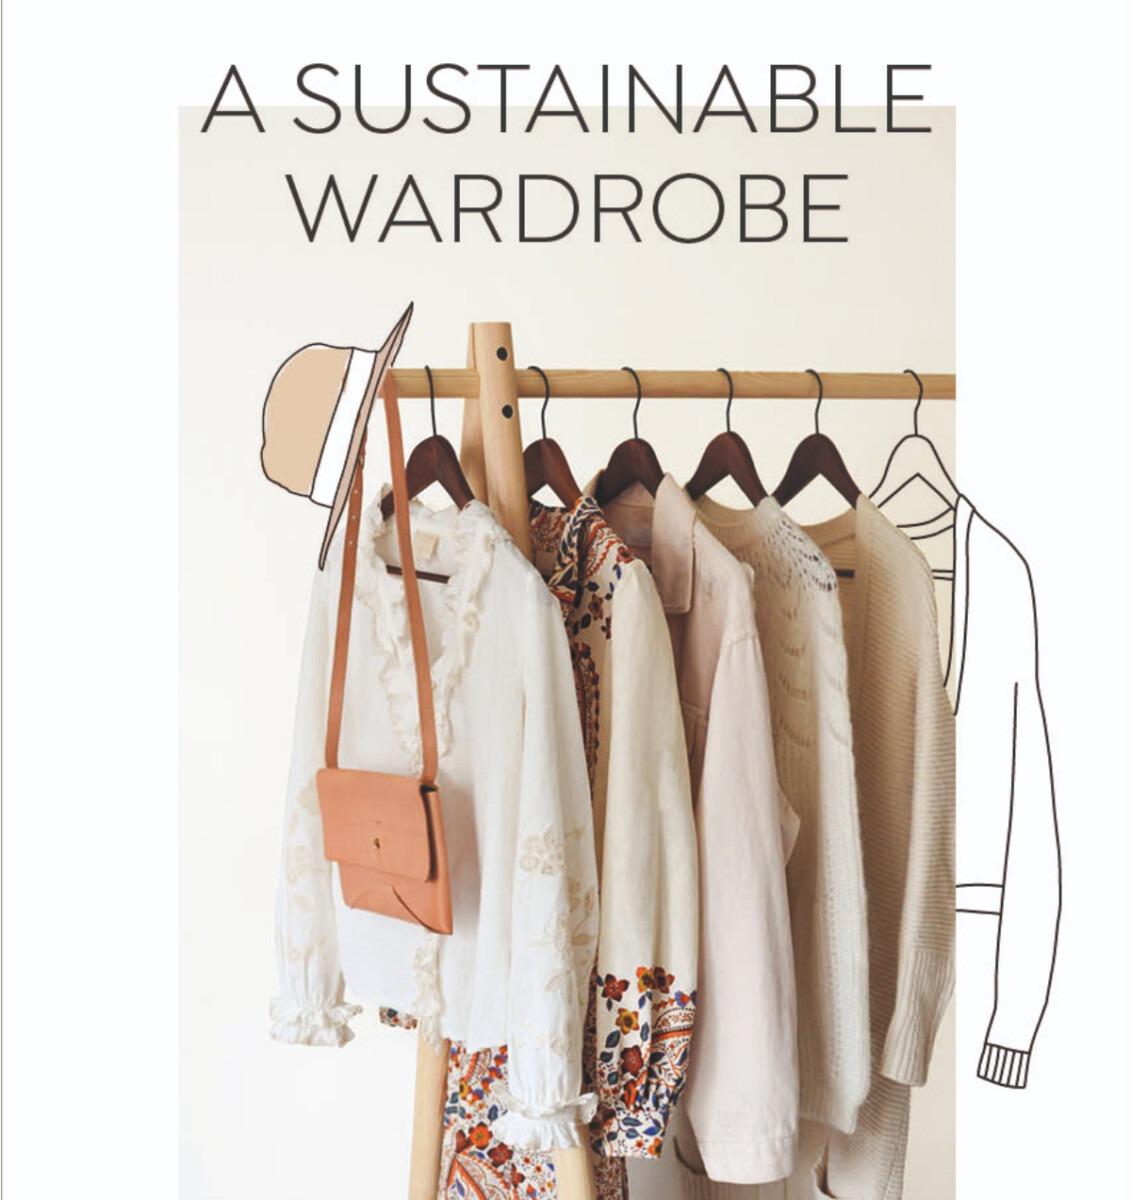 duurzame garderobe